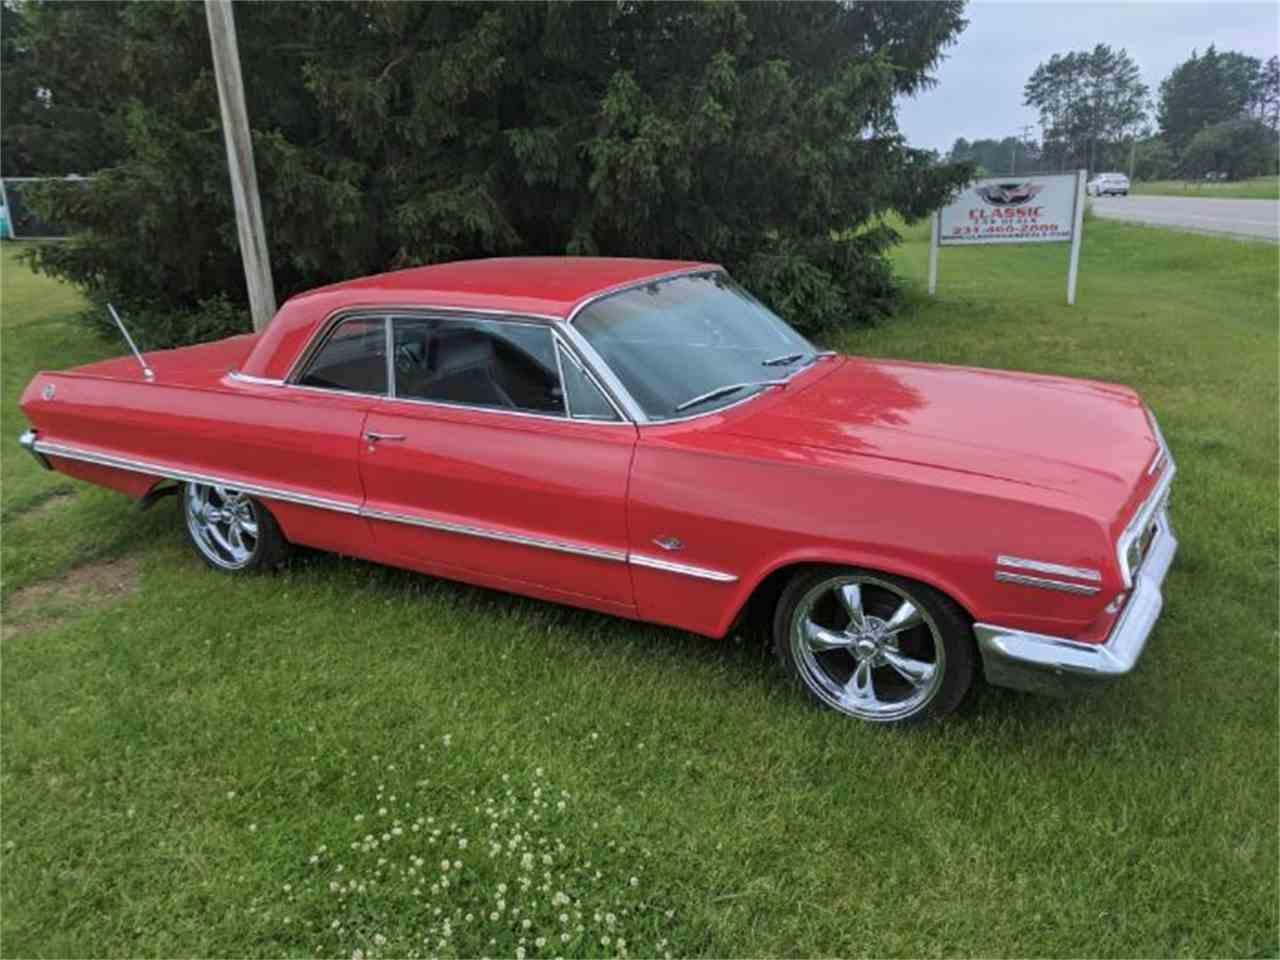 1963 Chevrolet Impala for Sale - CC-993288